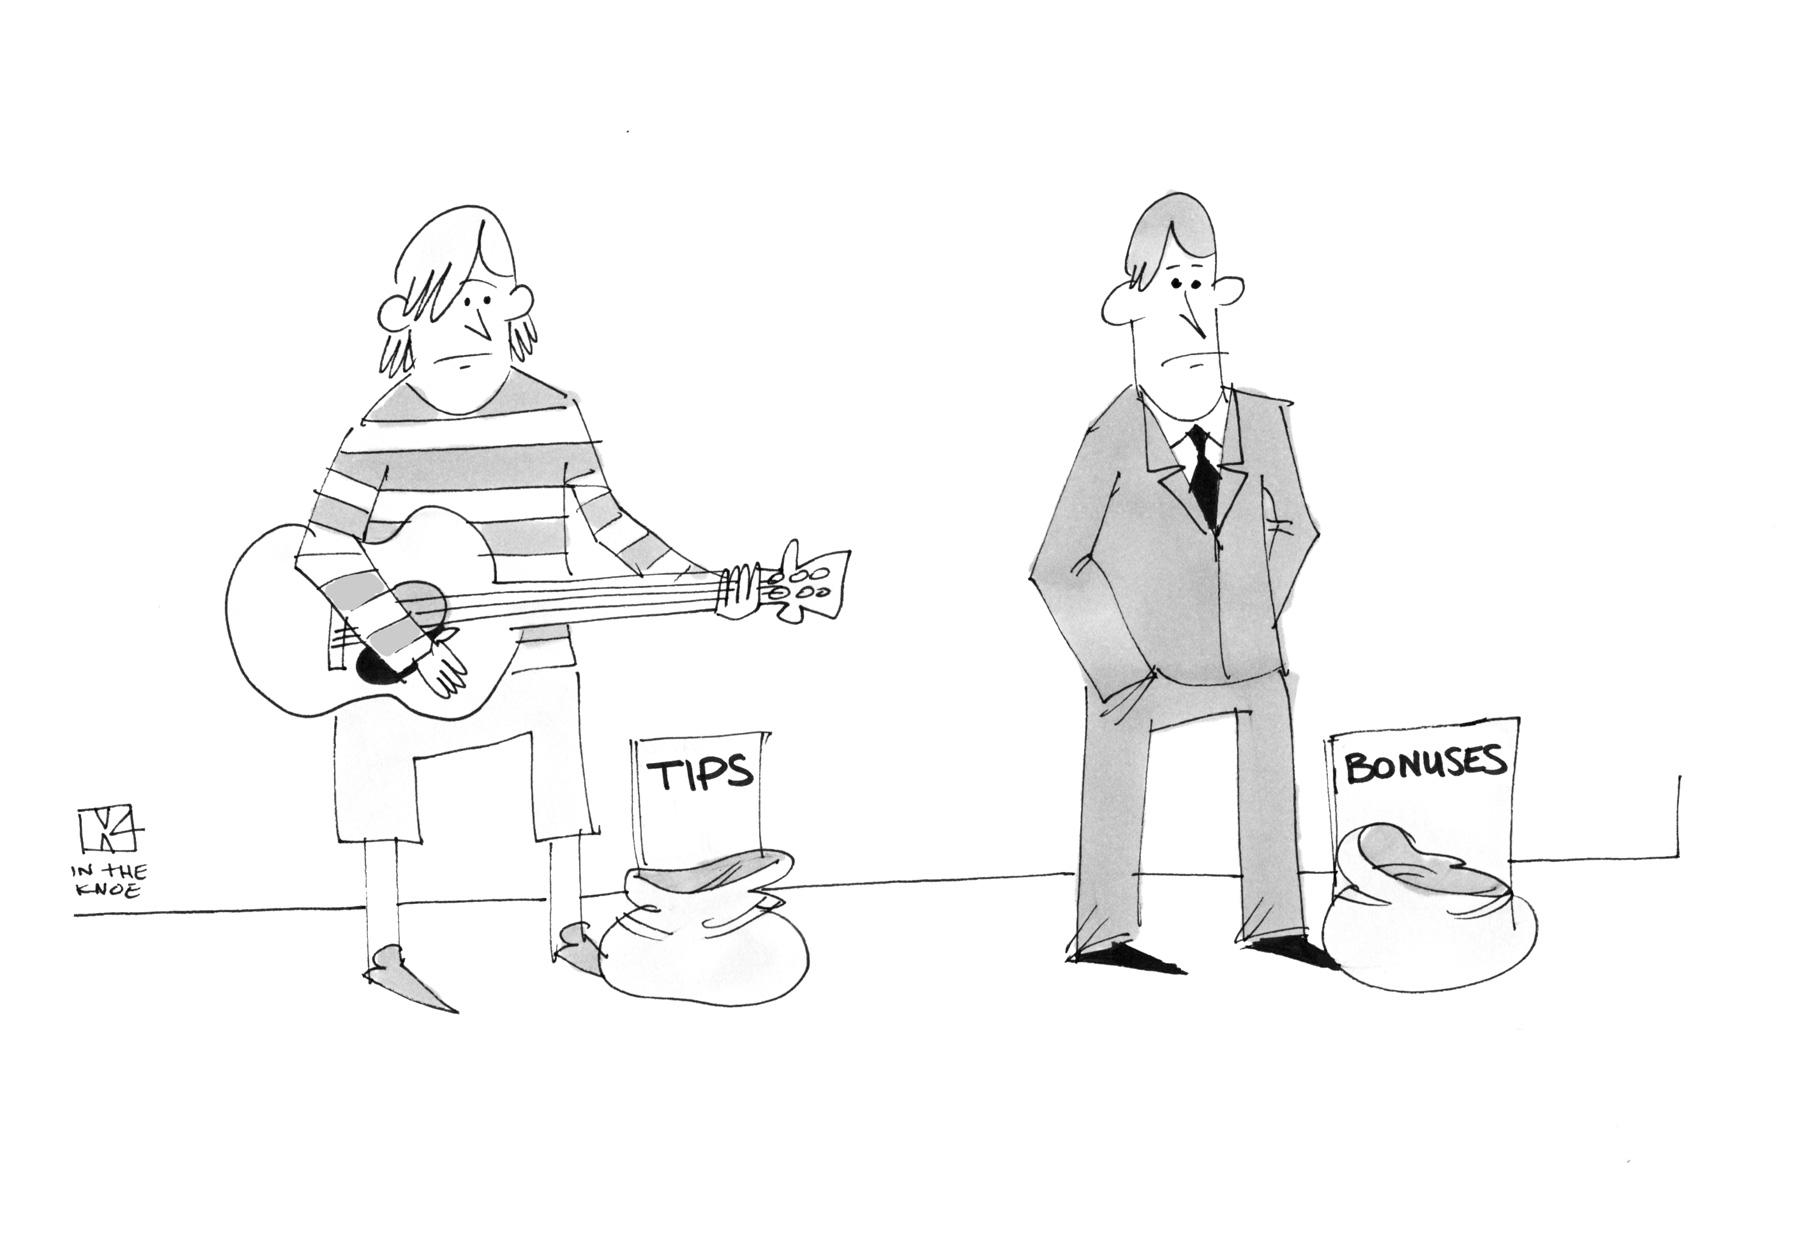 (Street musician has sign: 'Tips.' Businessman has sign: 'Bonuses.')